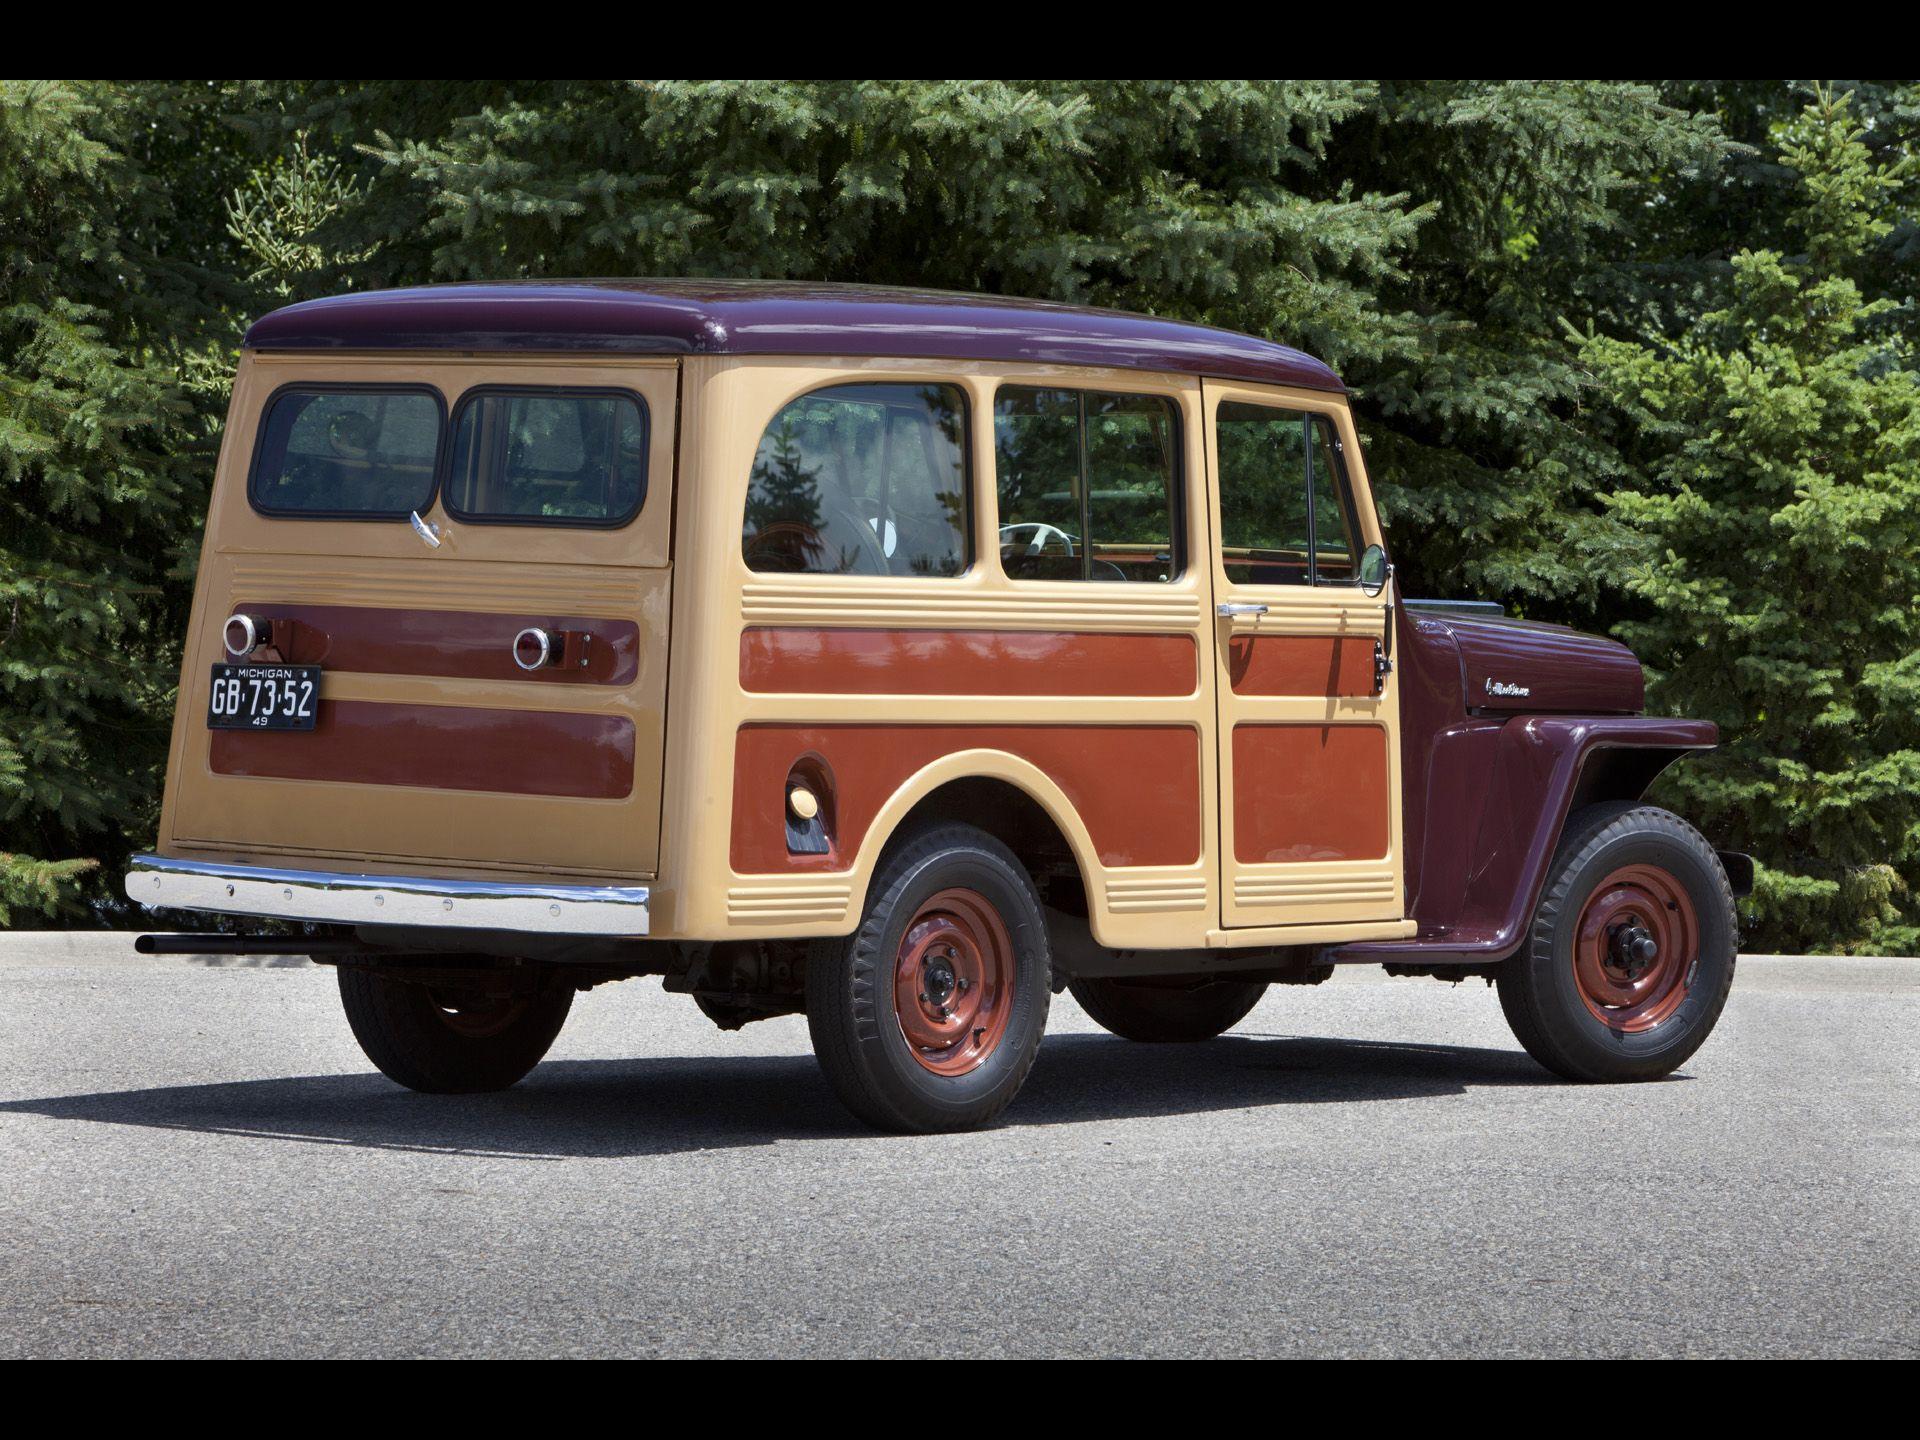 Jeep Willys Wagon For Sale #114 | Estancieras jeep willys